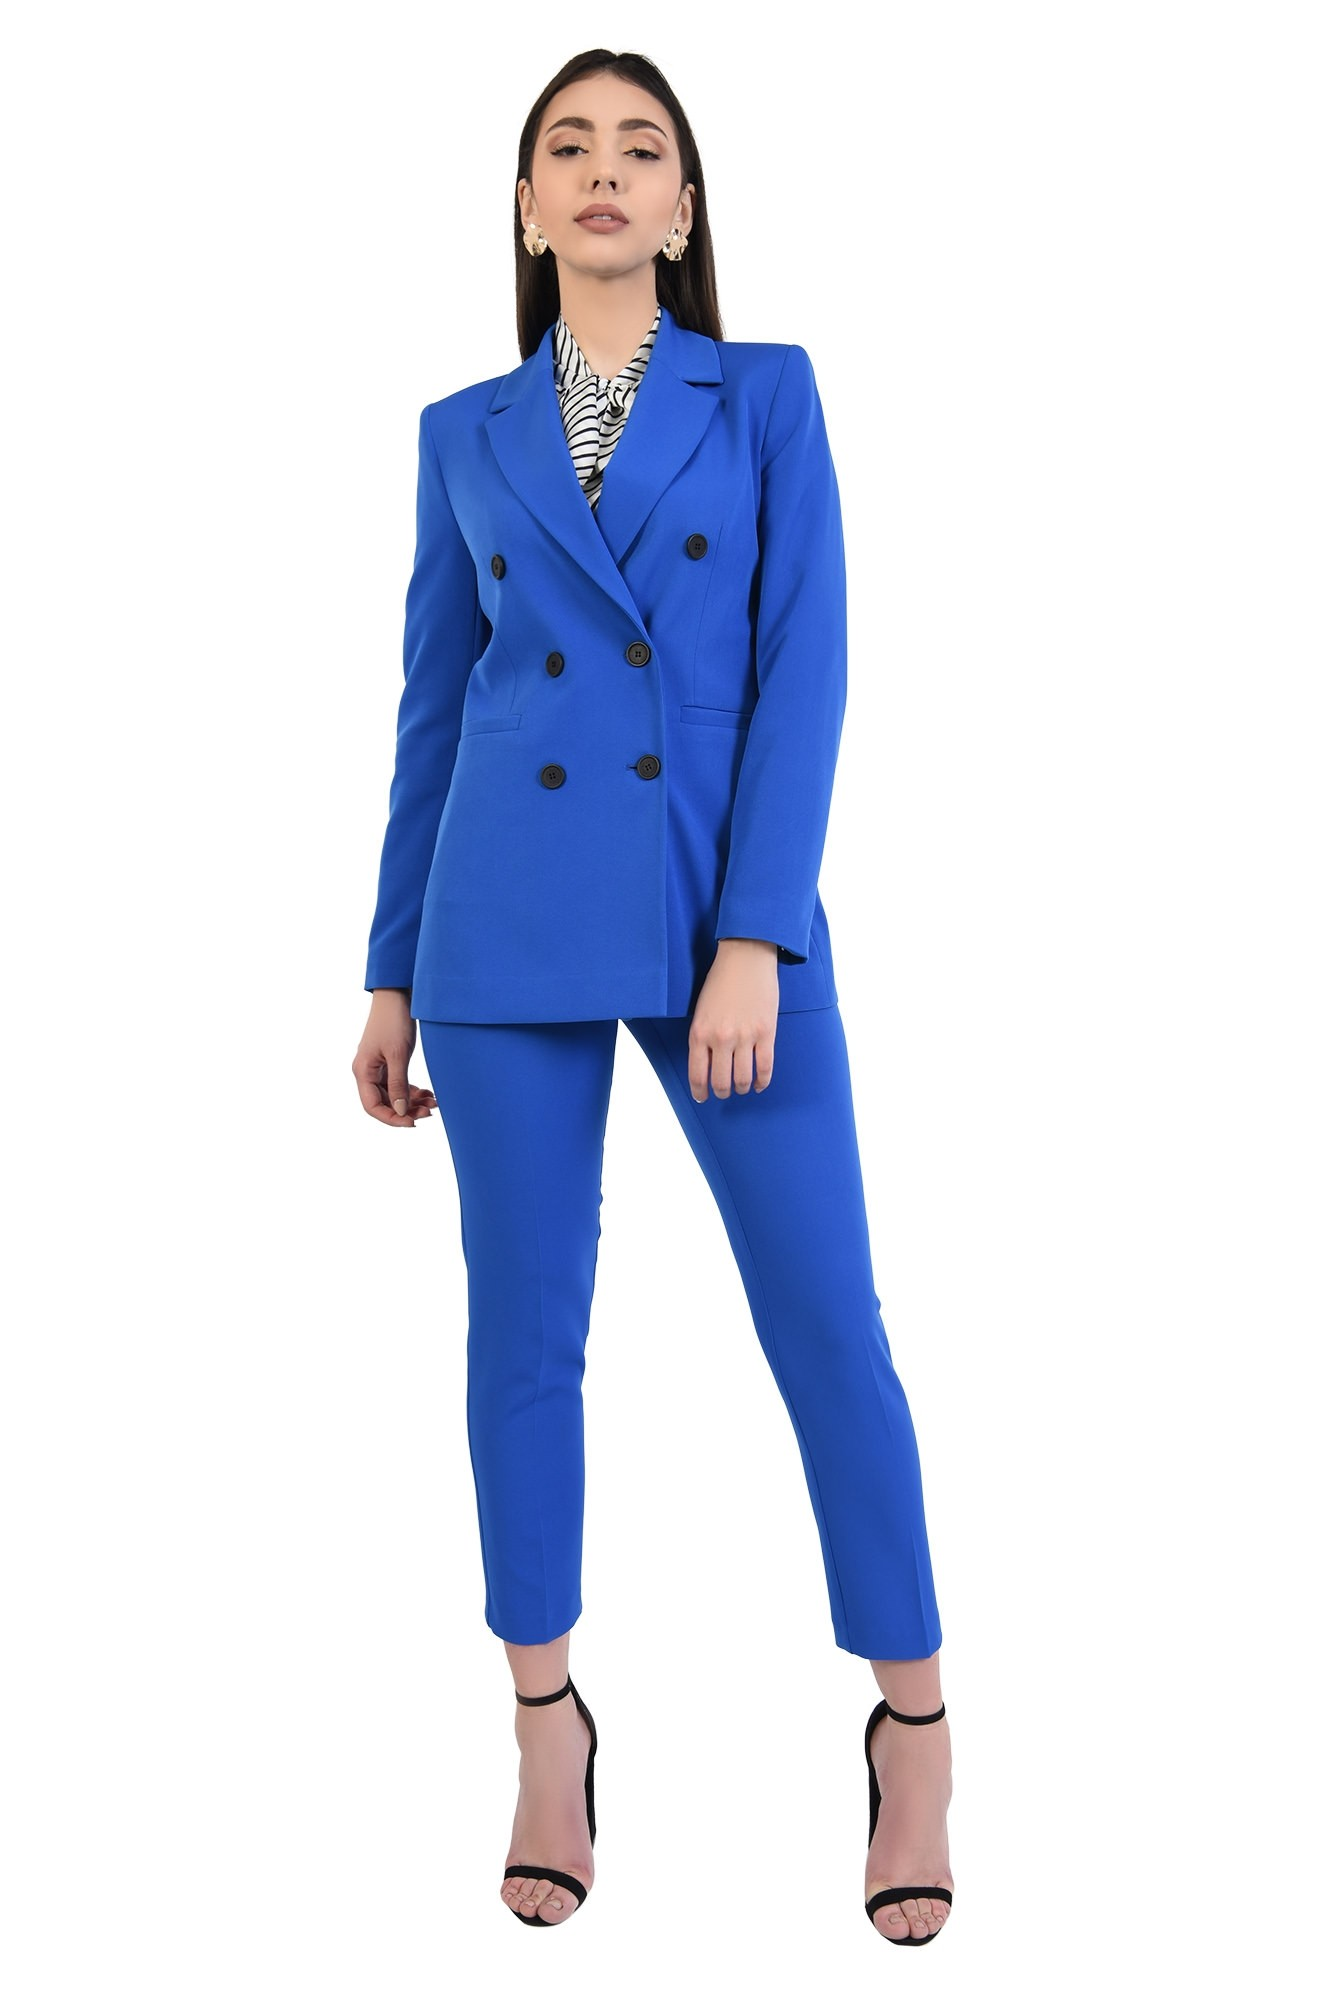 0 - pantaloni conici, albastri, lungi, croi tigareta, talie medie